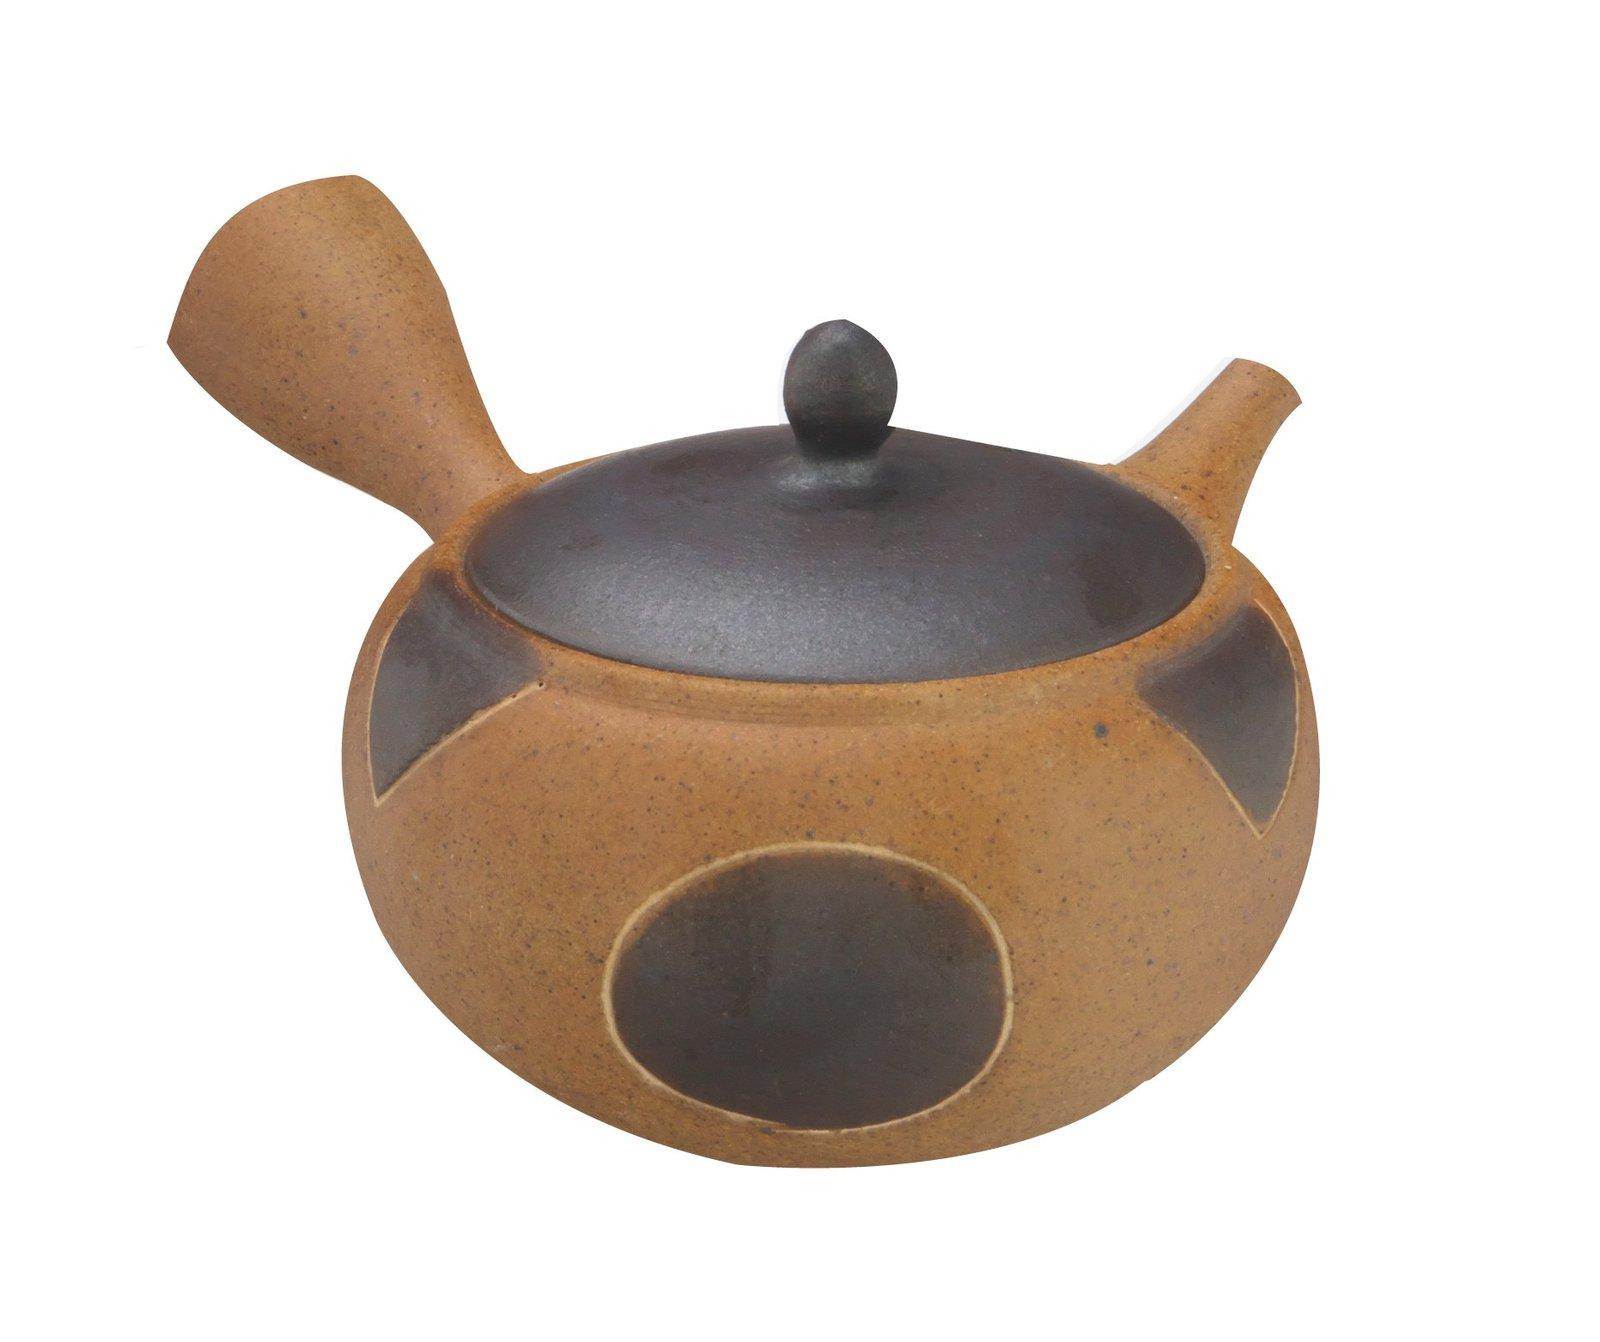 TOKYO MATCHA SELECTION - Tokoname Pottery ISSHIN Japanese Kyusu Pot 400cc wit... - $65.33